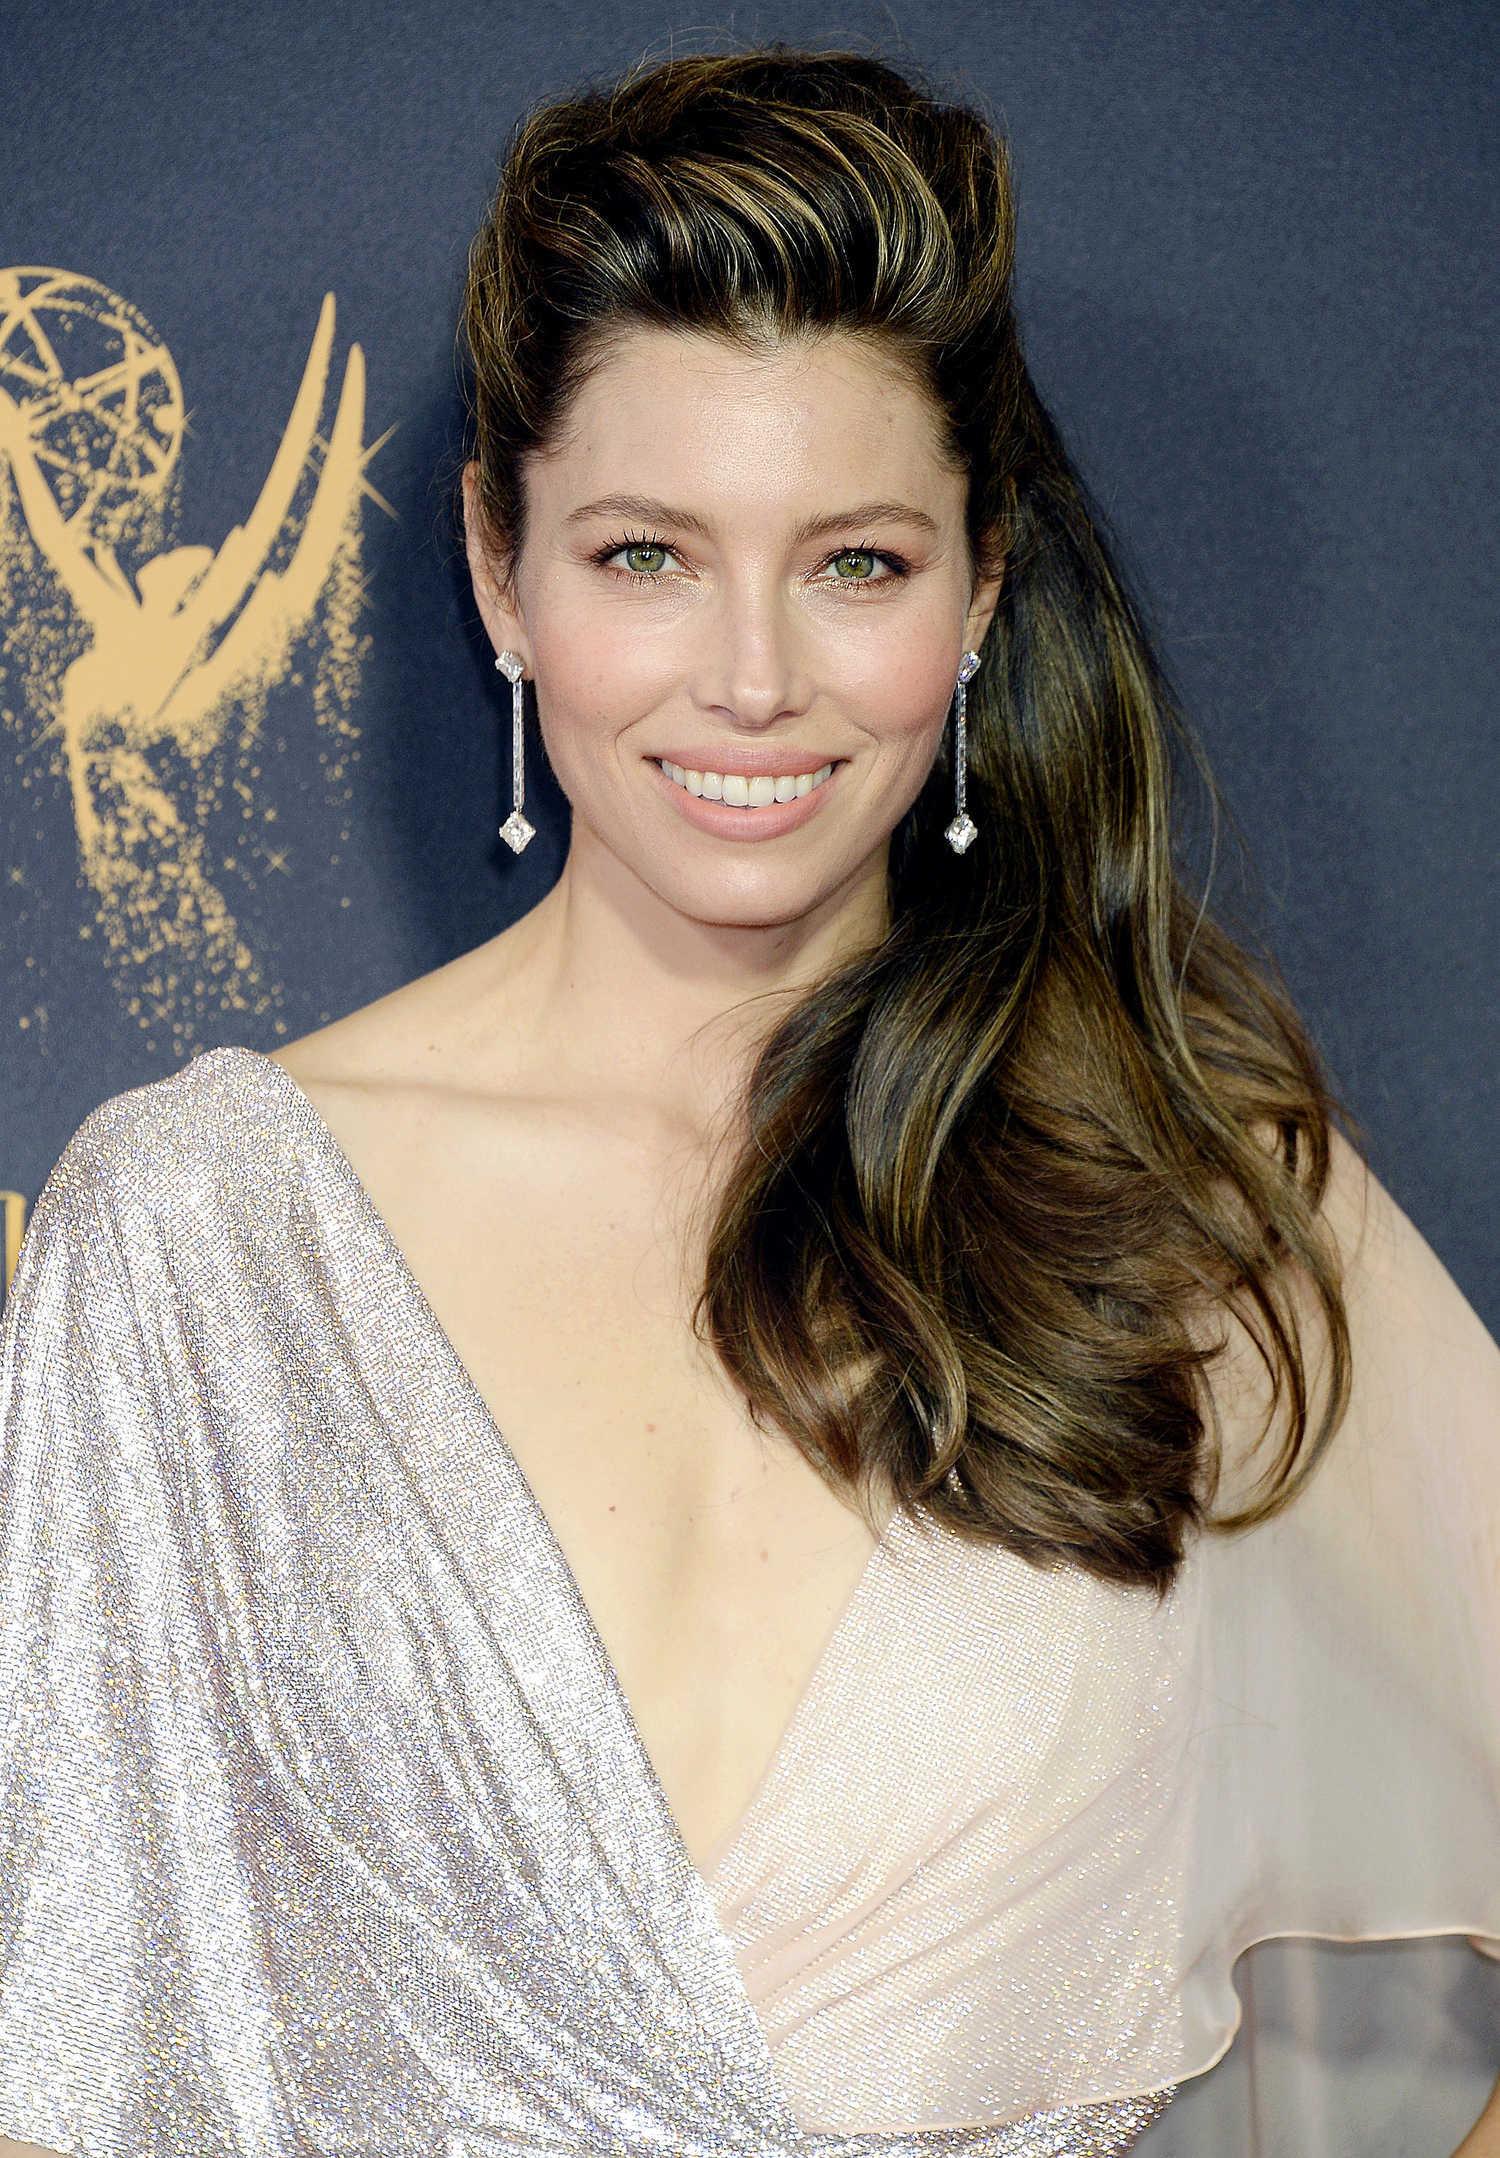 Jessica Biel at the 69th Annual Primetime Emmy Awards in ... Jessica Biel